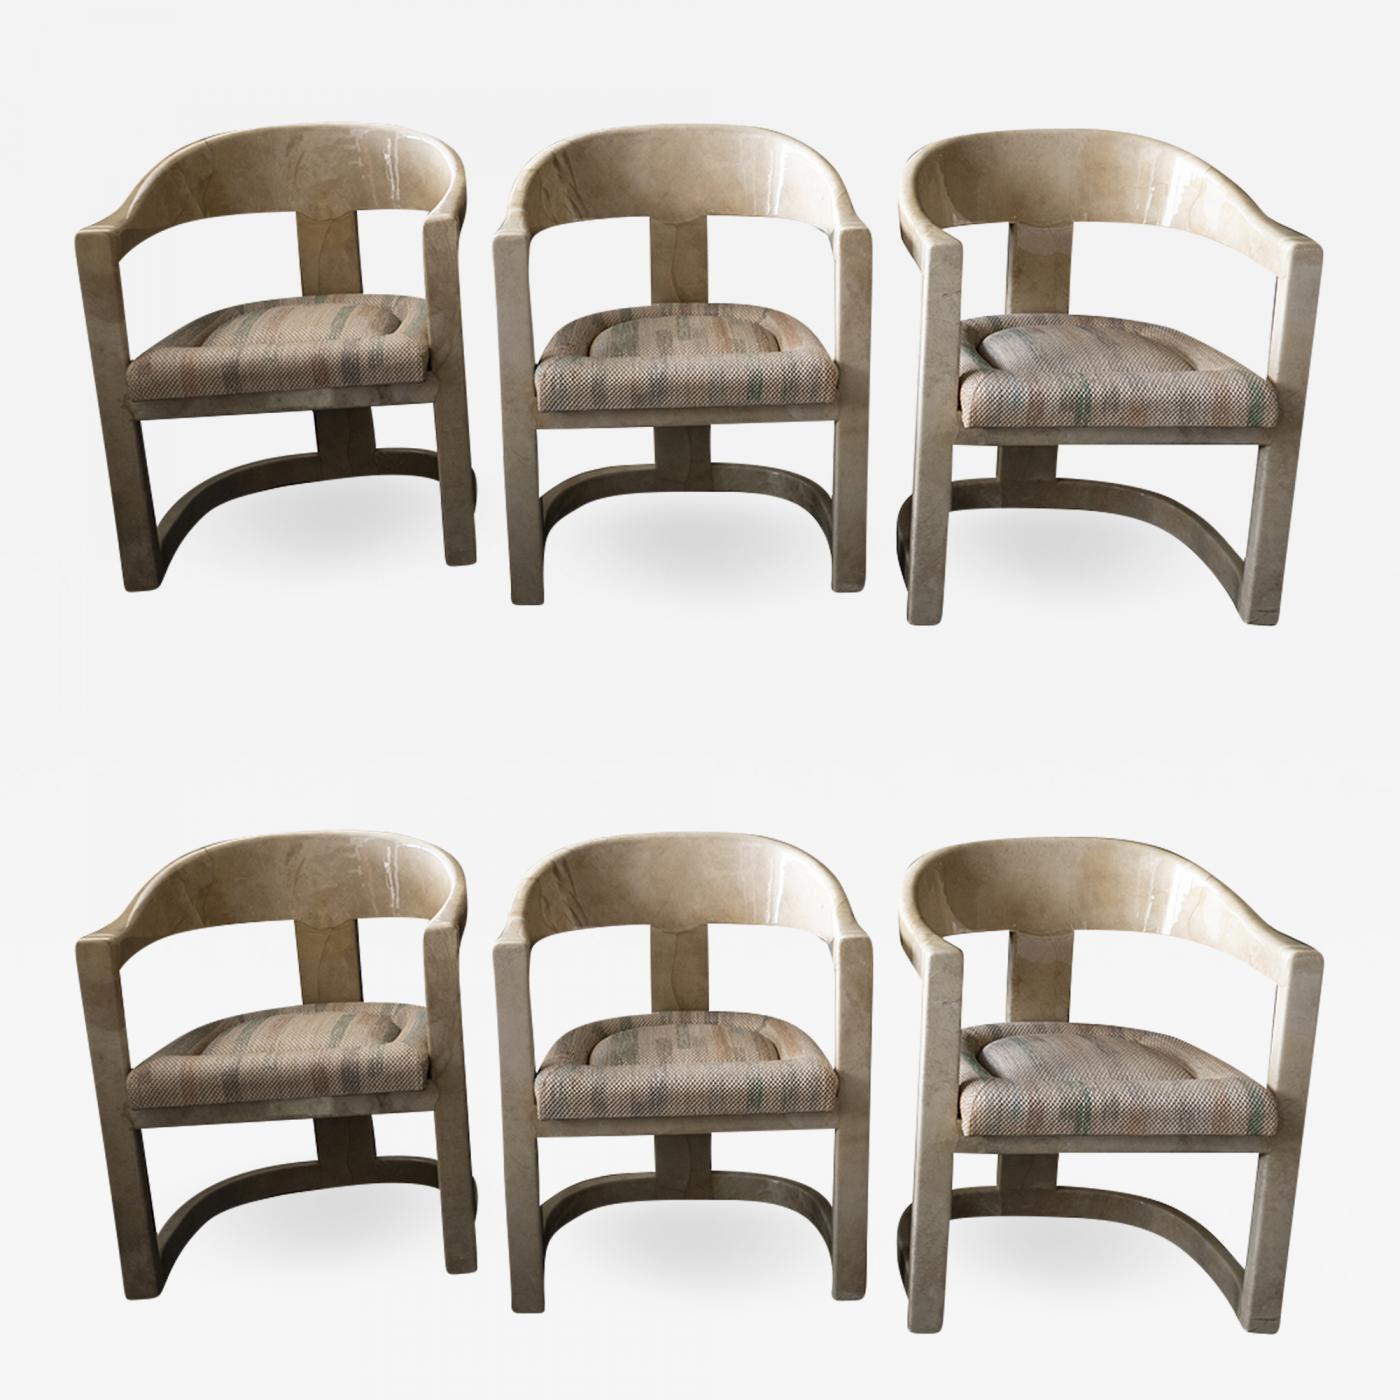 Surprising Karl Springer Set Of 6 American Modern Goatskin Onassis Chairs Download Free Architecture Designs Itiscsunscenecom